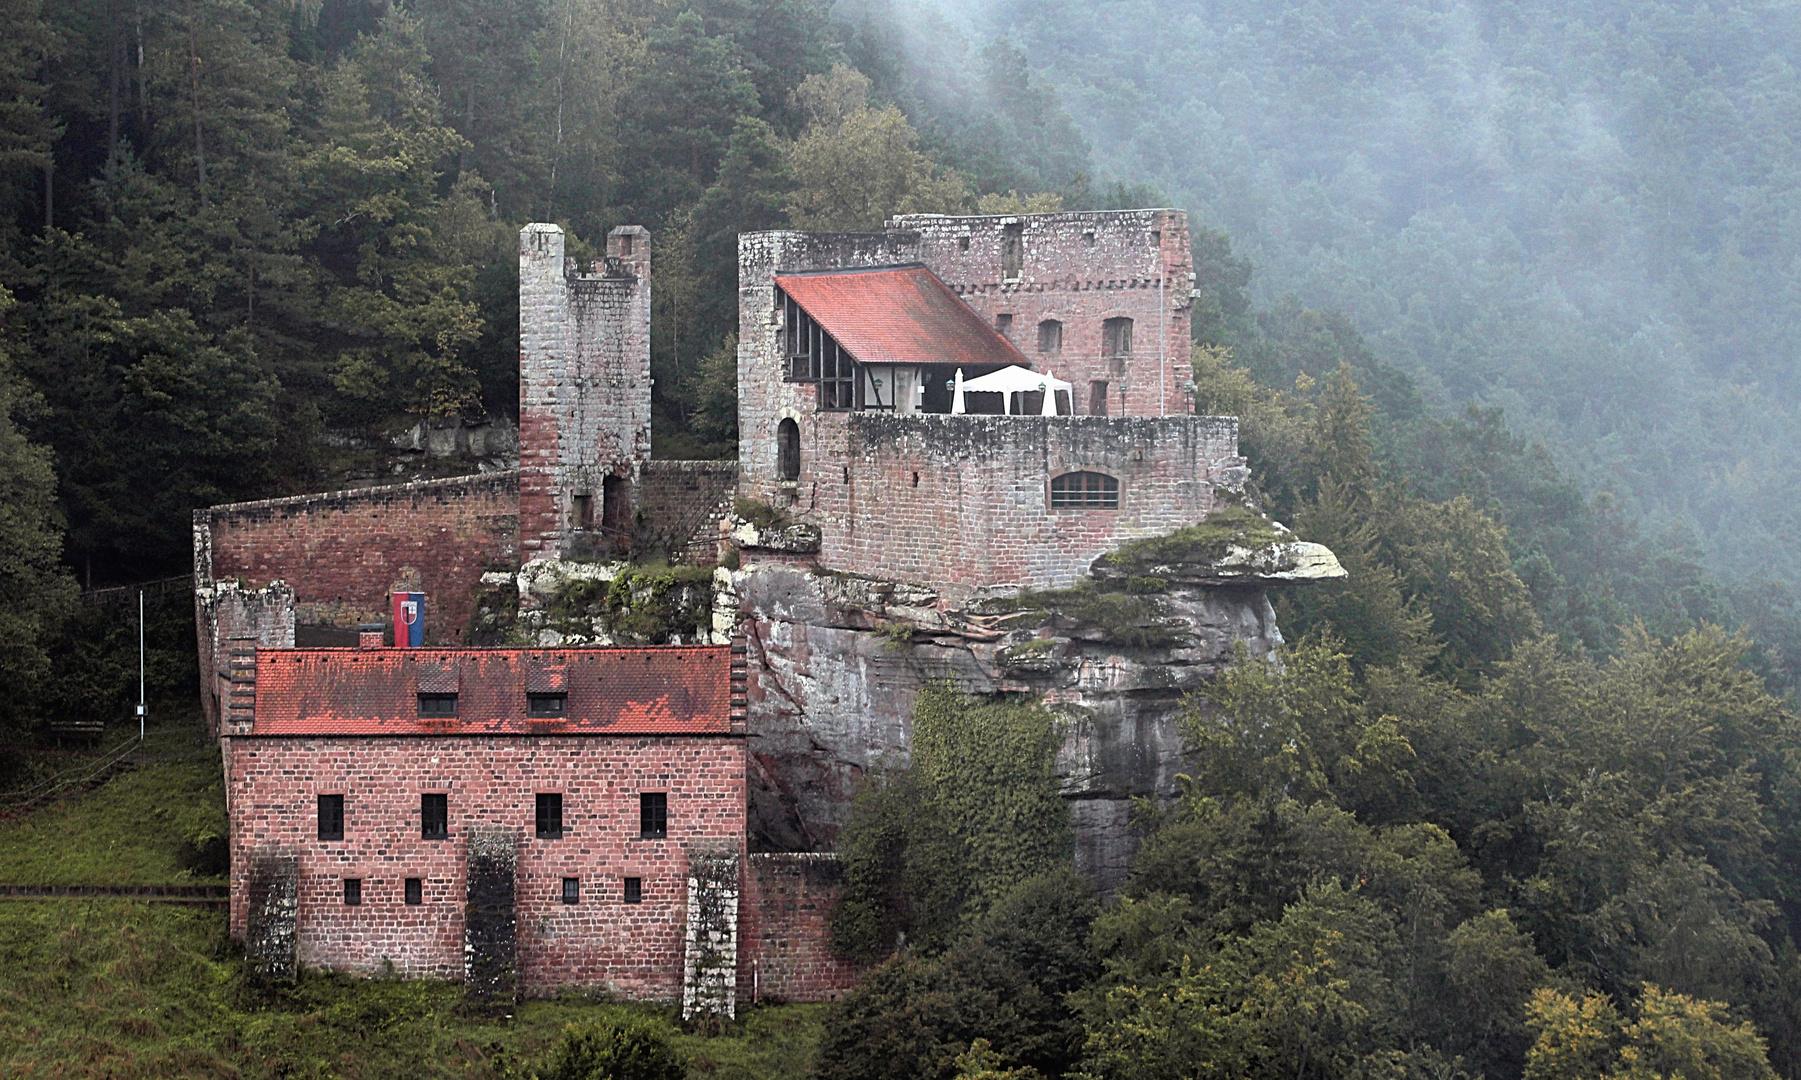 Burgruine Spangenberg